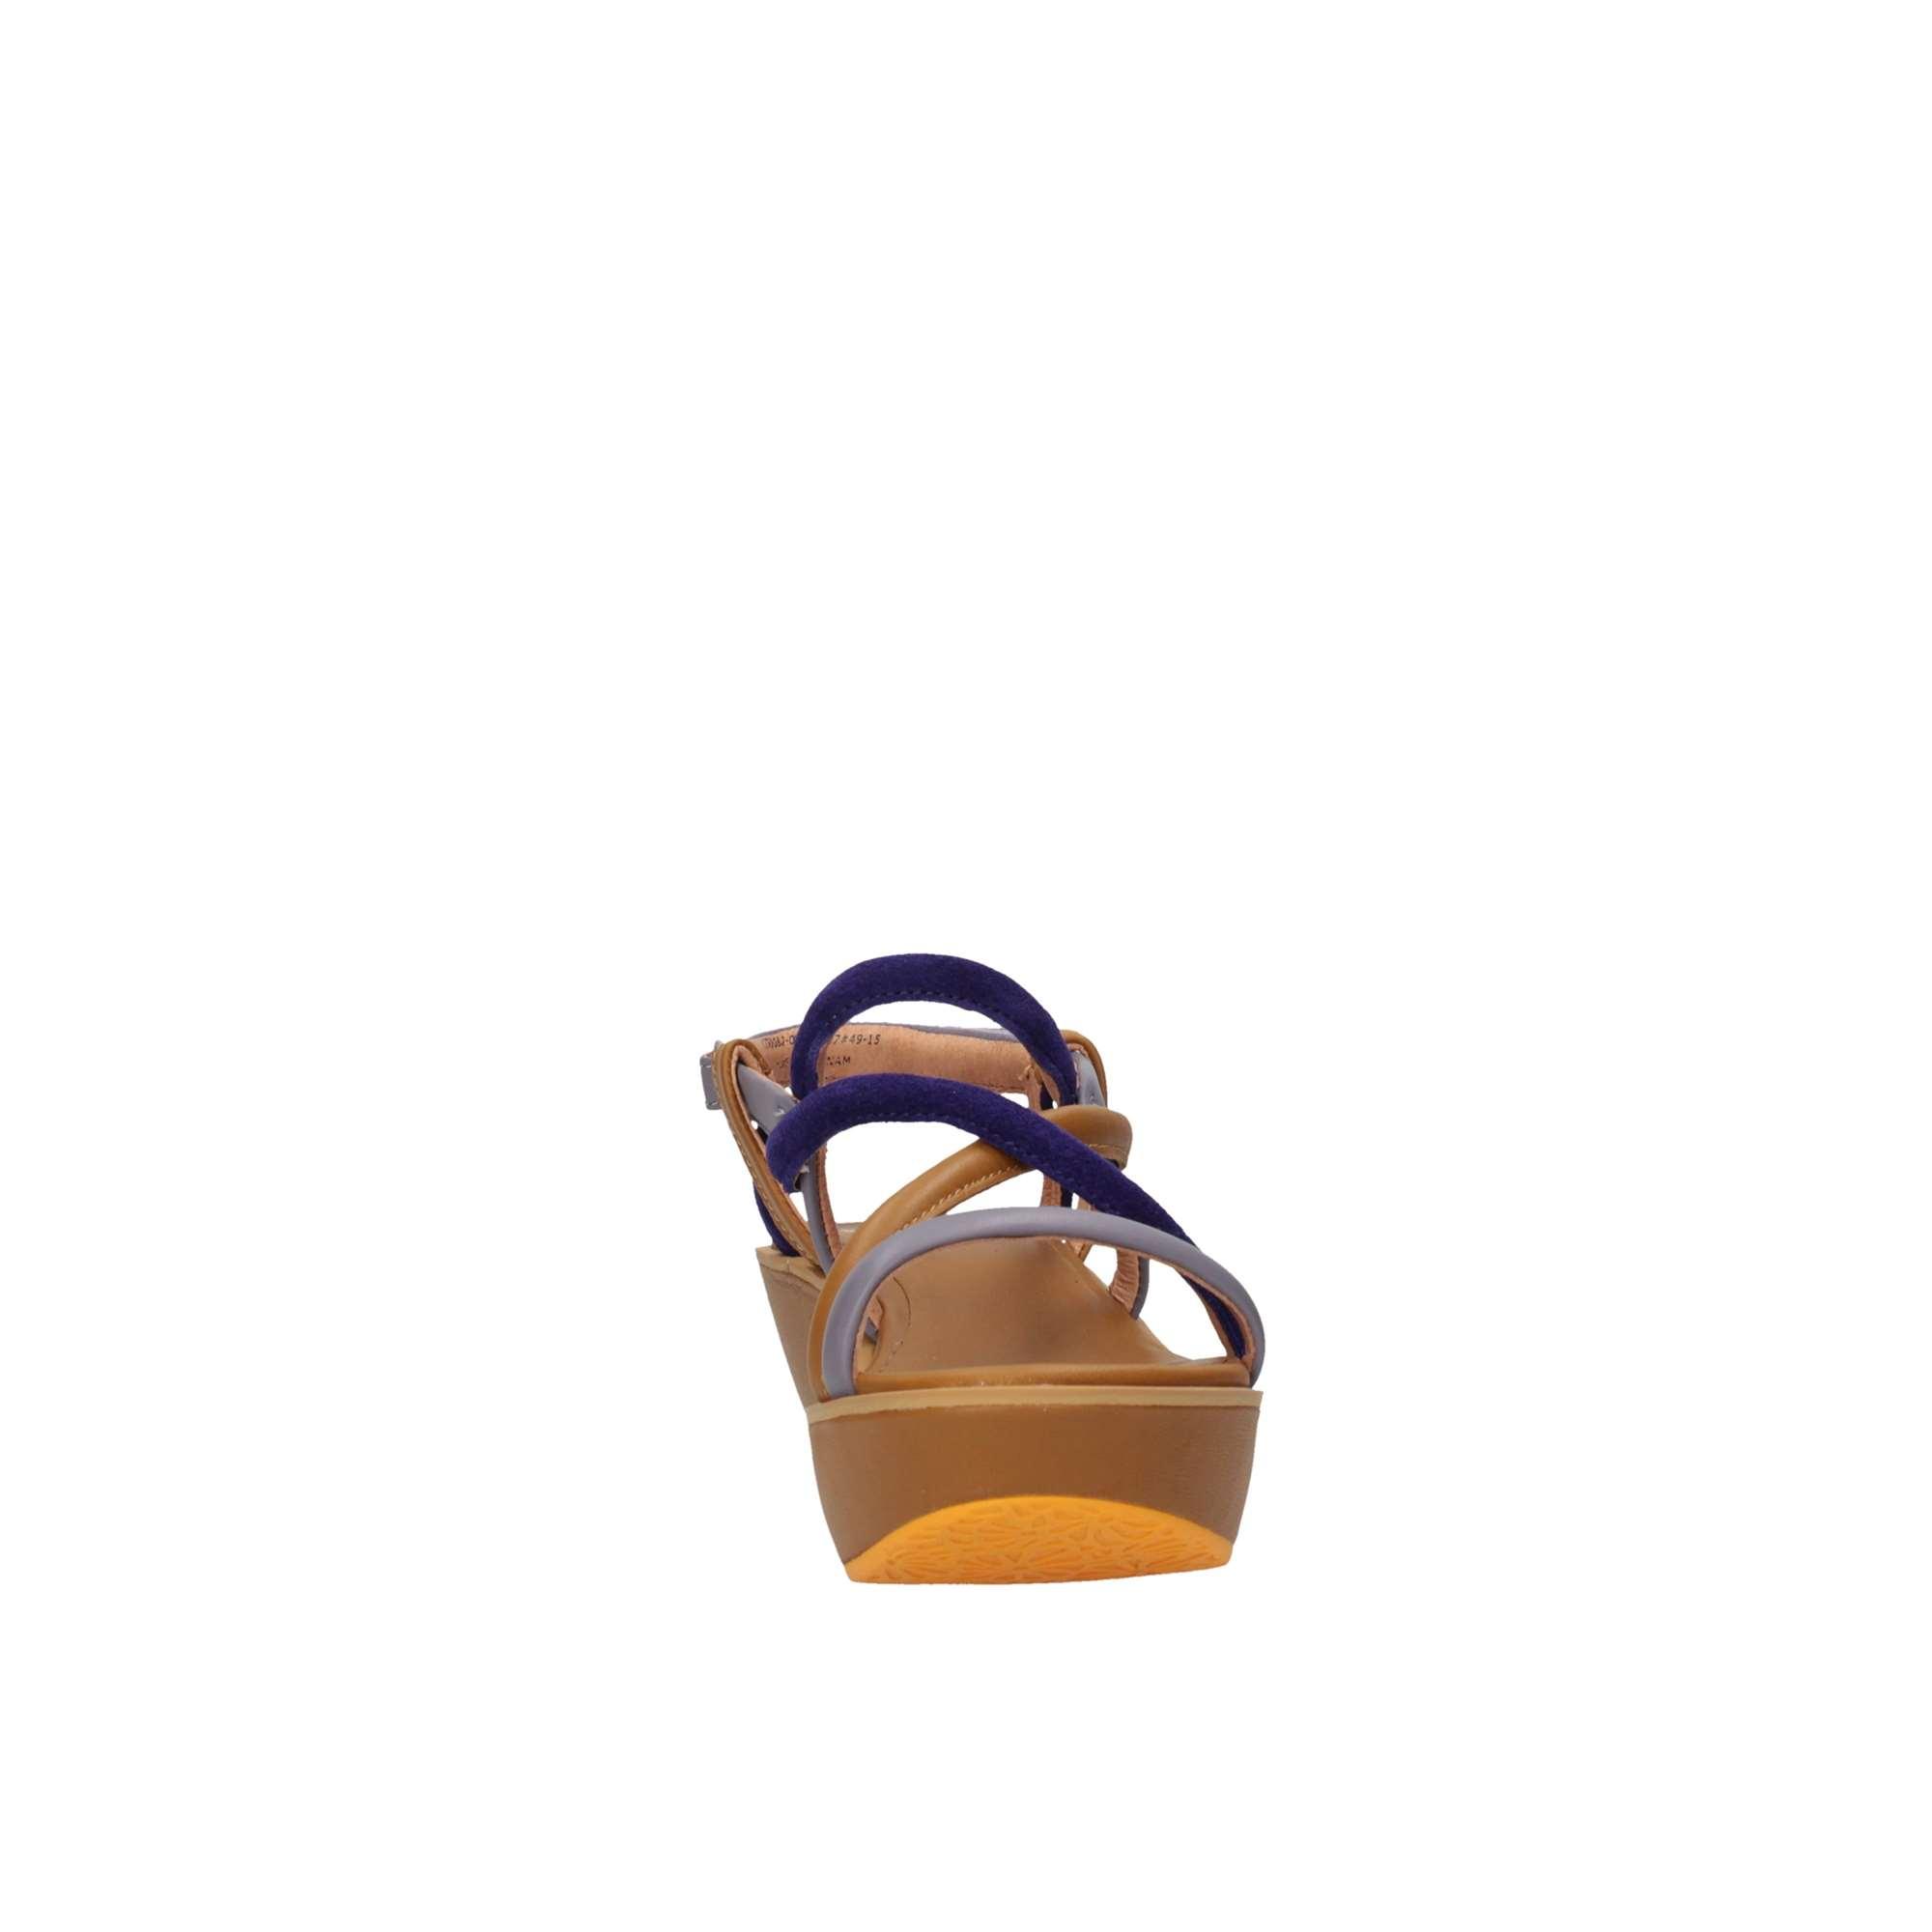 Sandalo-Donna-Camper-CASK200082-003-Primavera-Estate